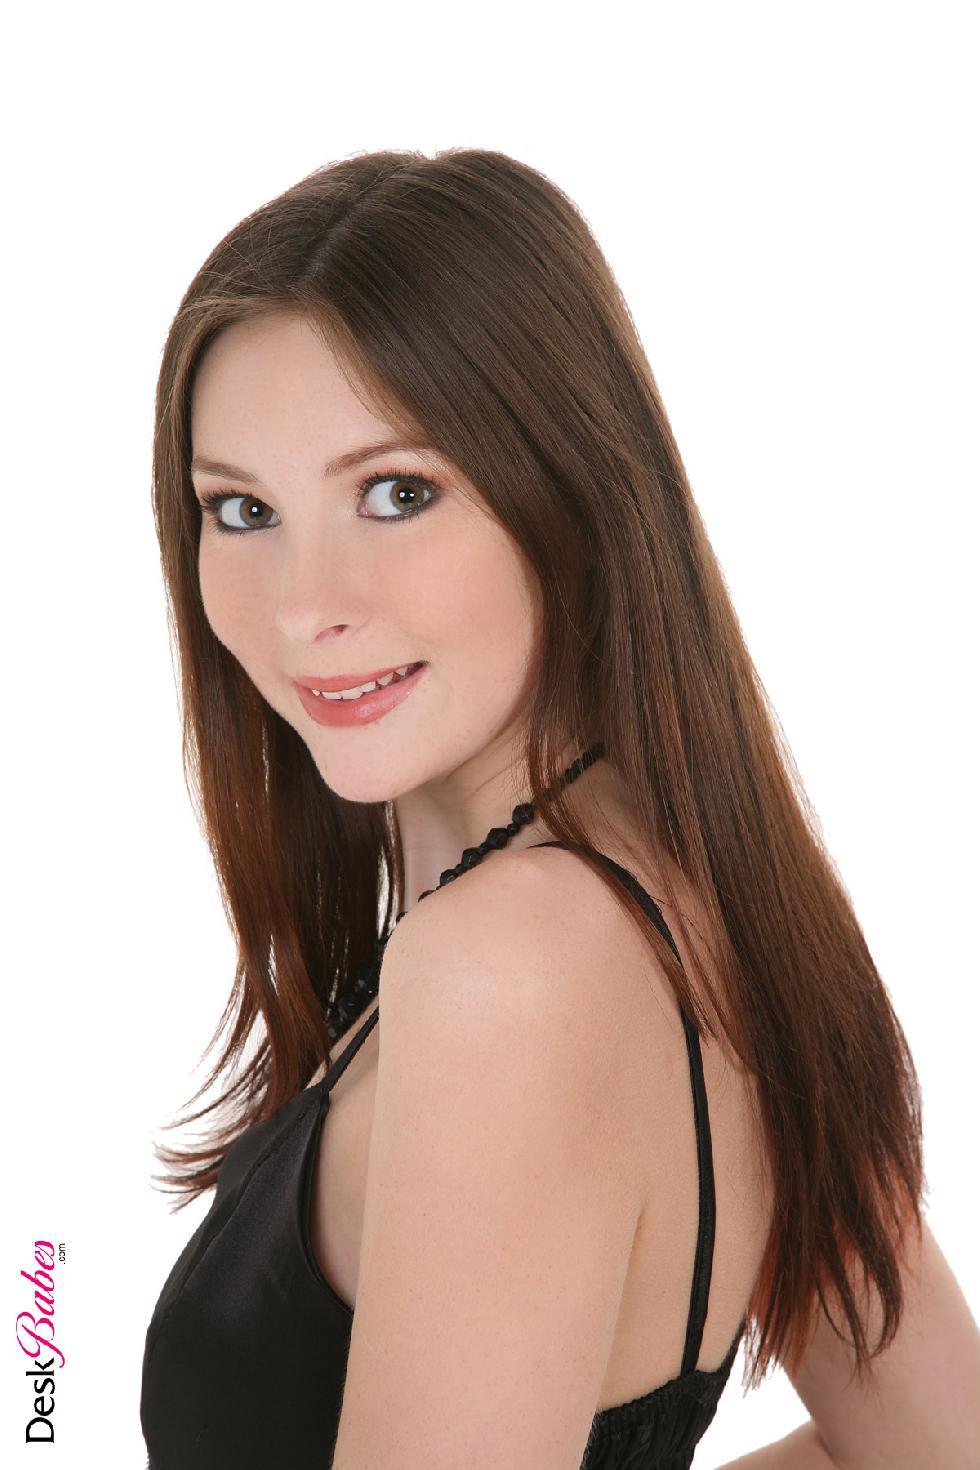 Beautiful Kattie Gold likes anal sex - 1